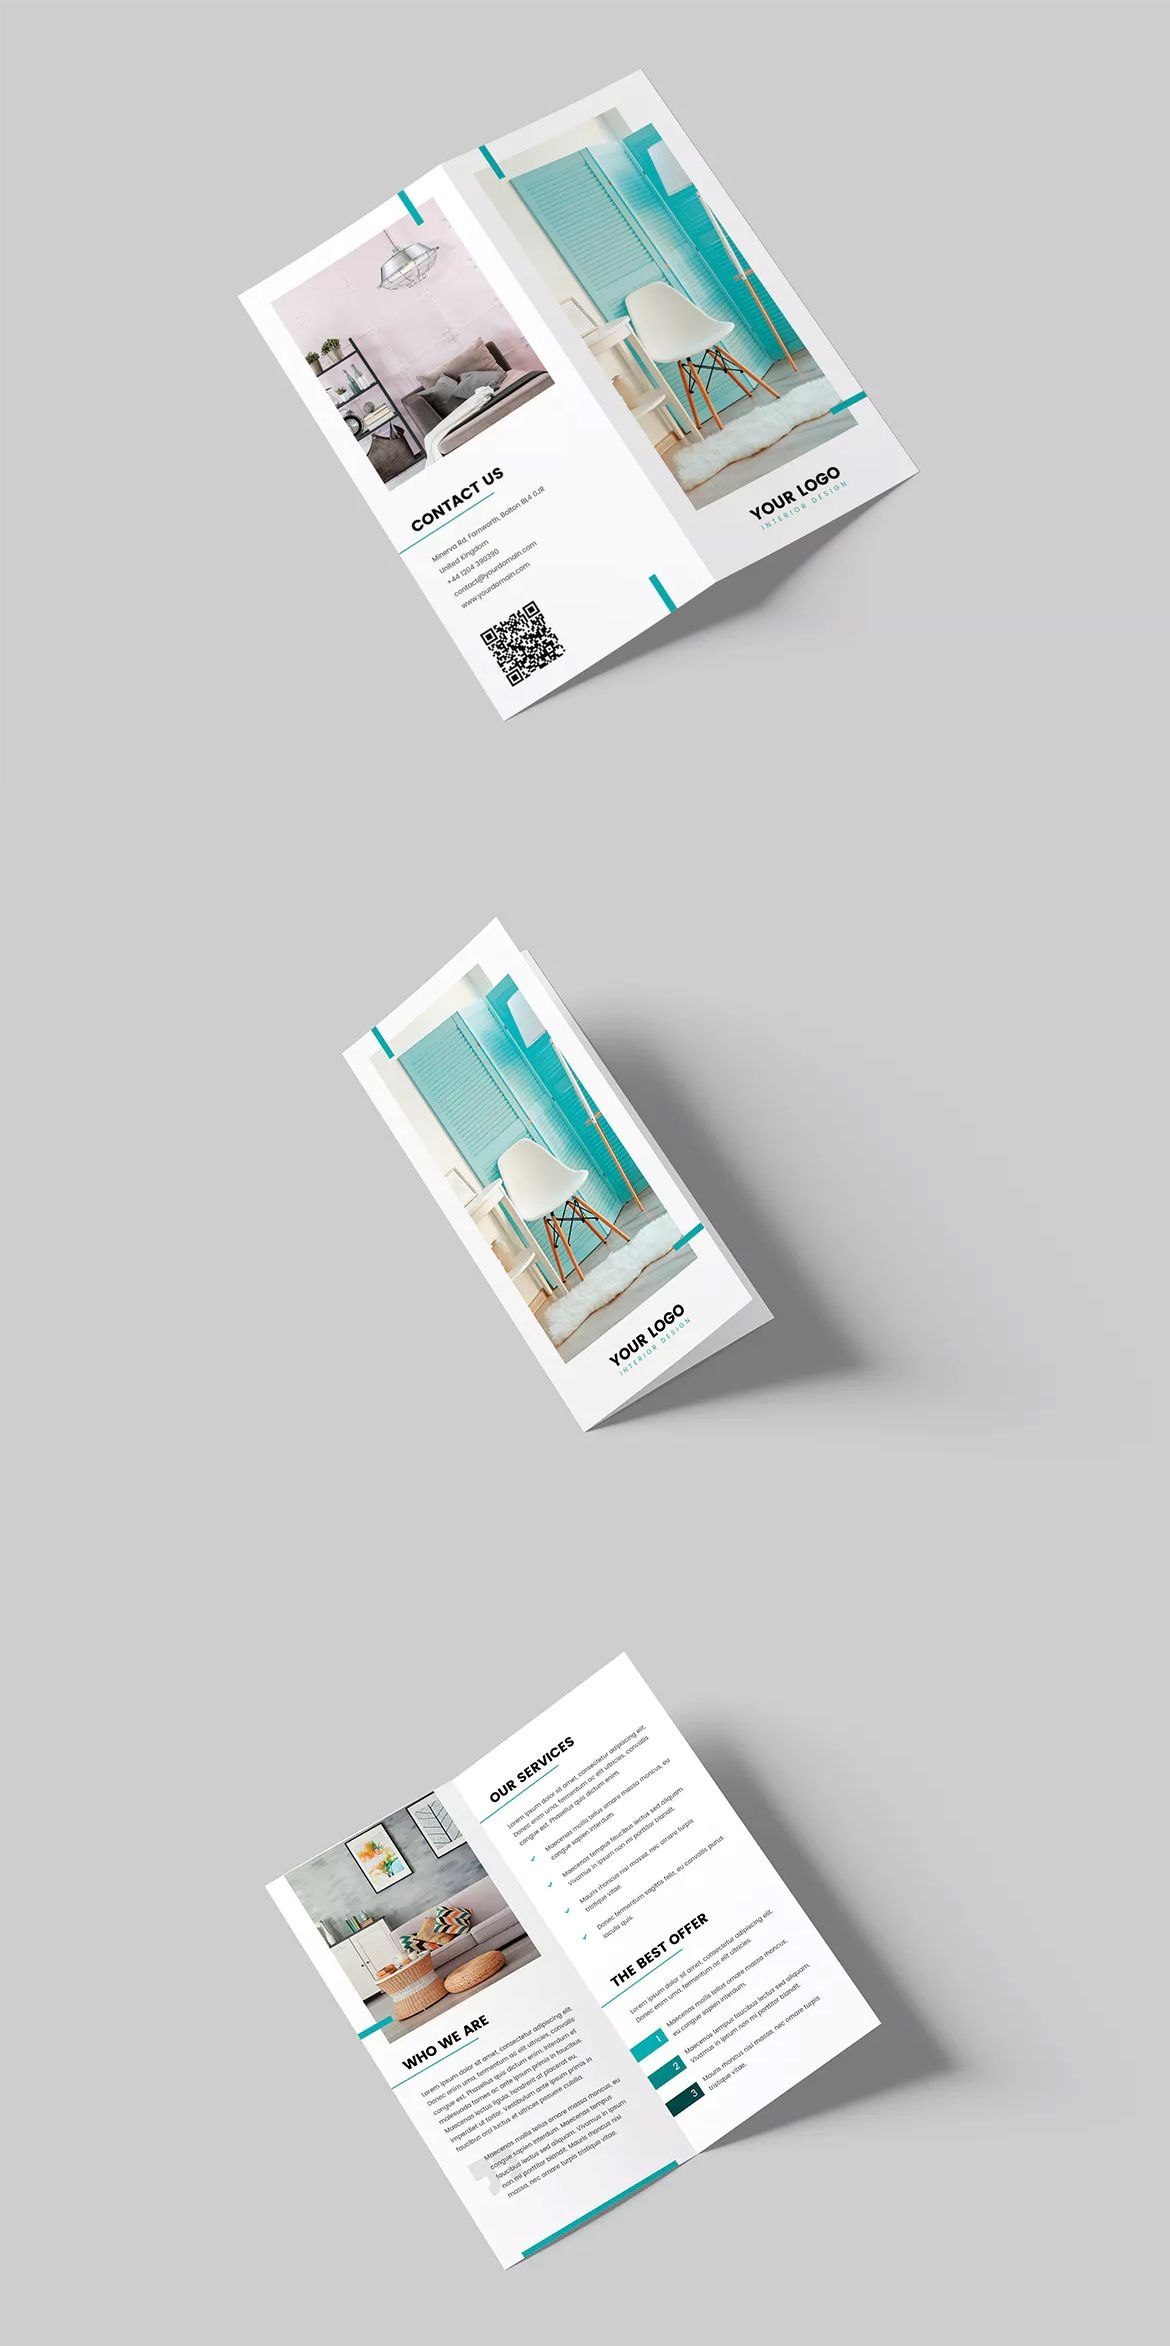 Interior Design Bifold Dl Brochure Template Psd  Brochure Design For Hotel Brochure Design Templates